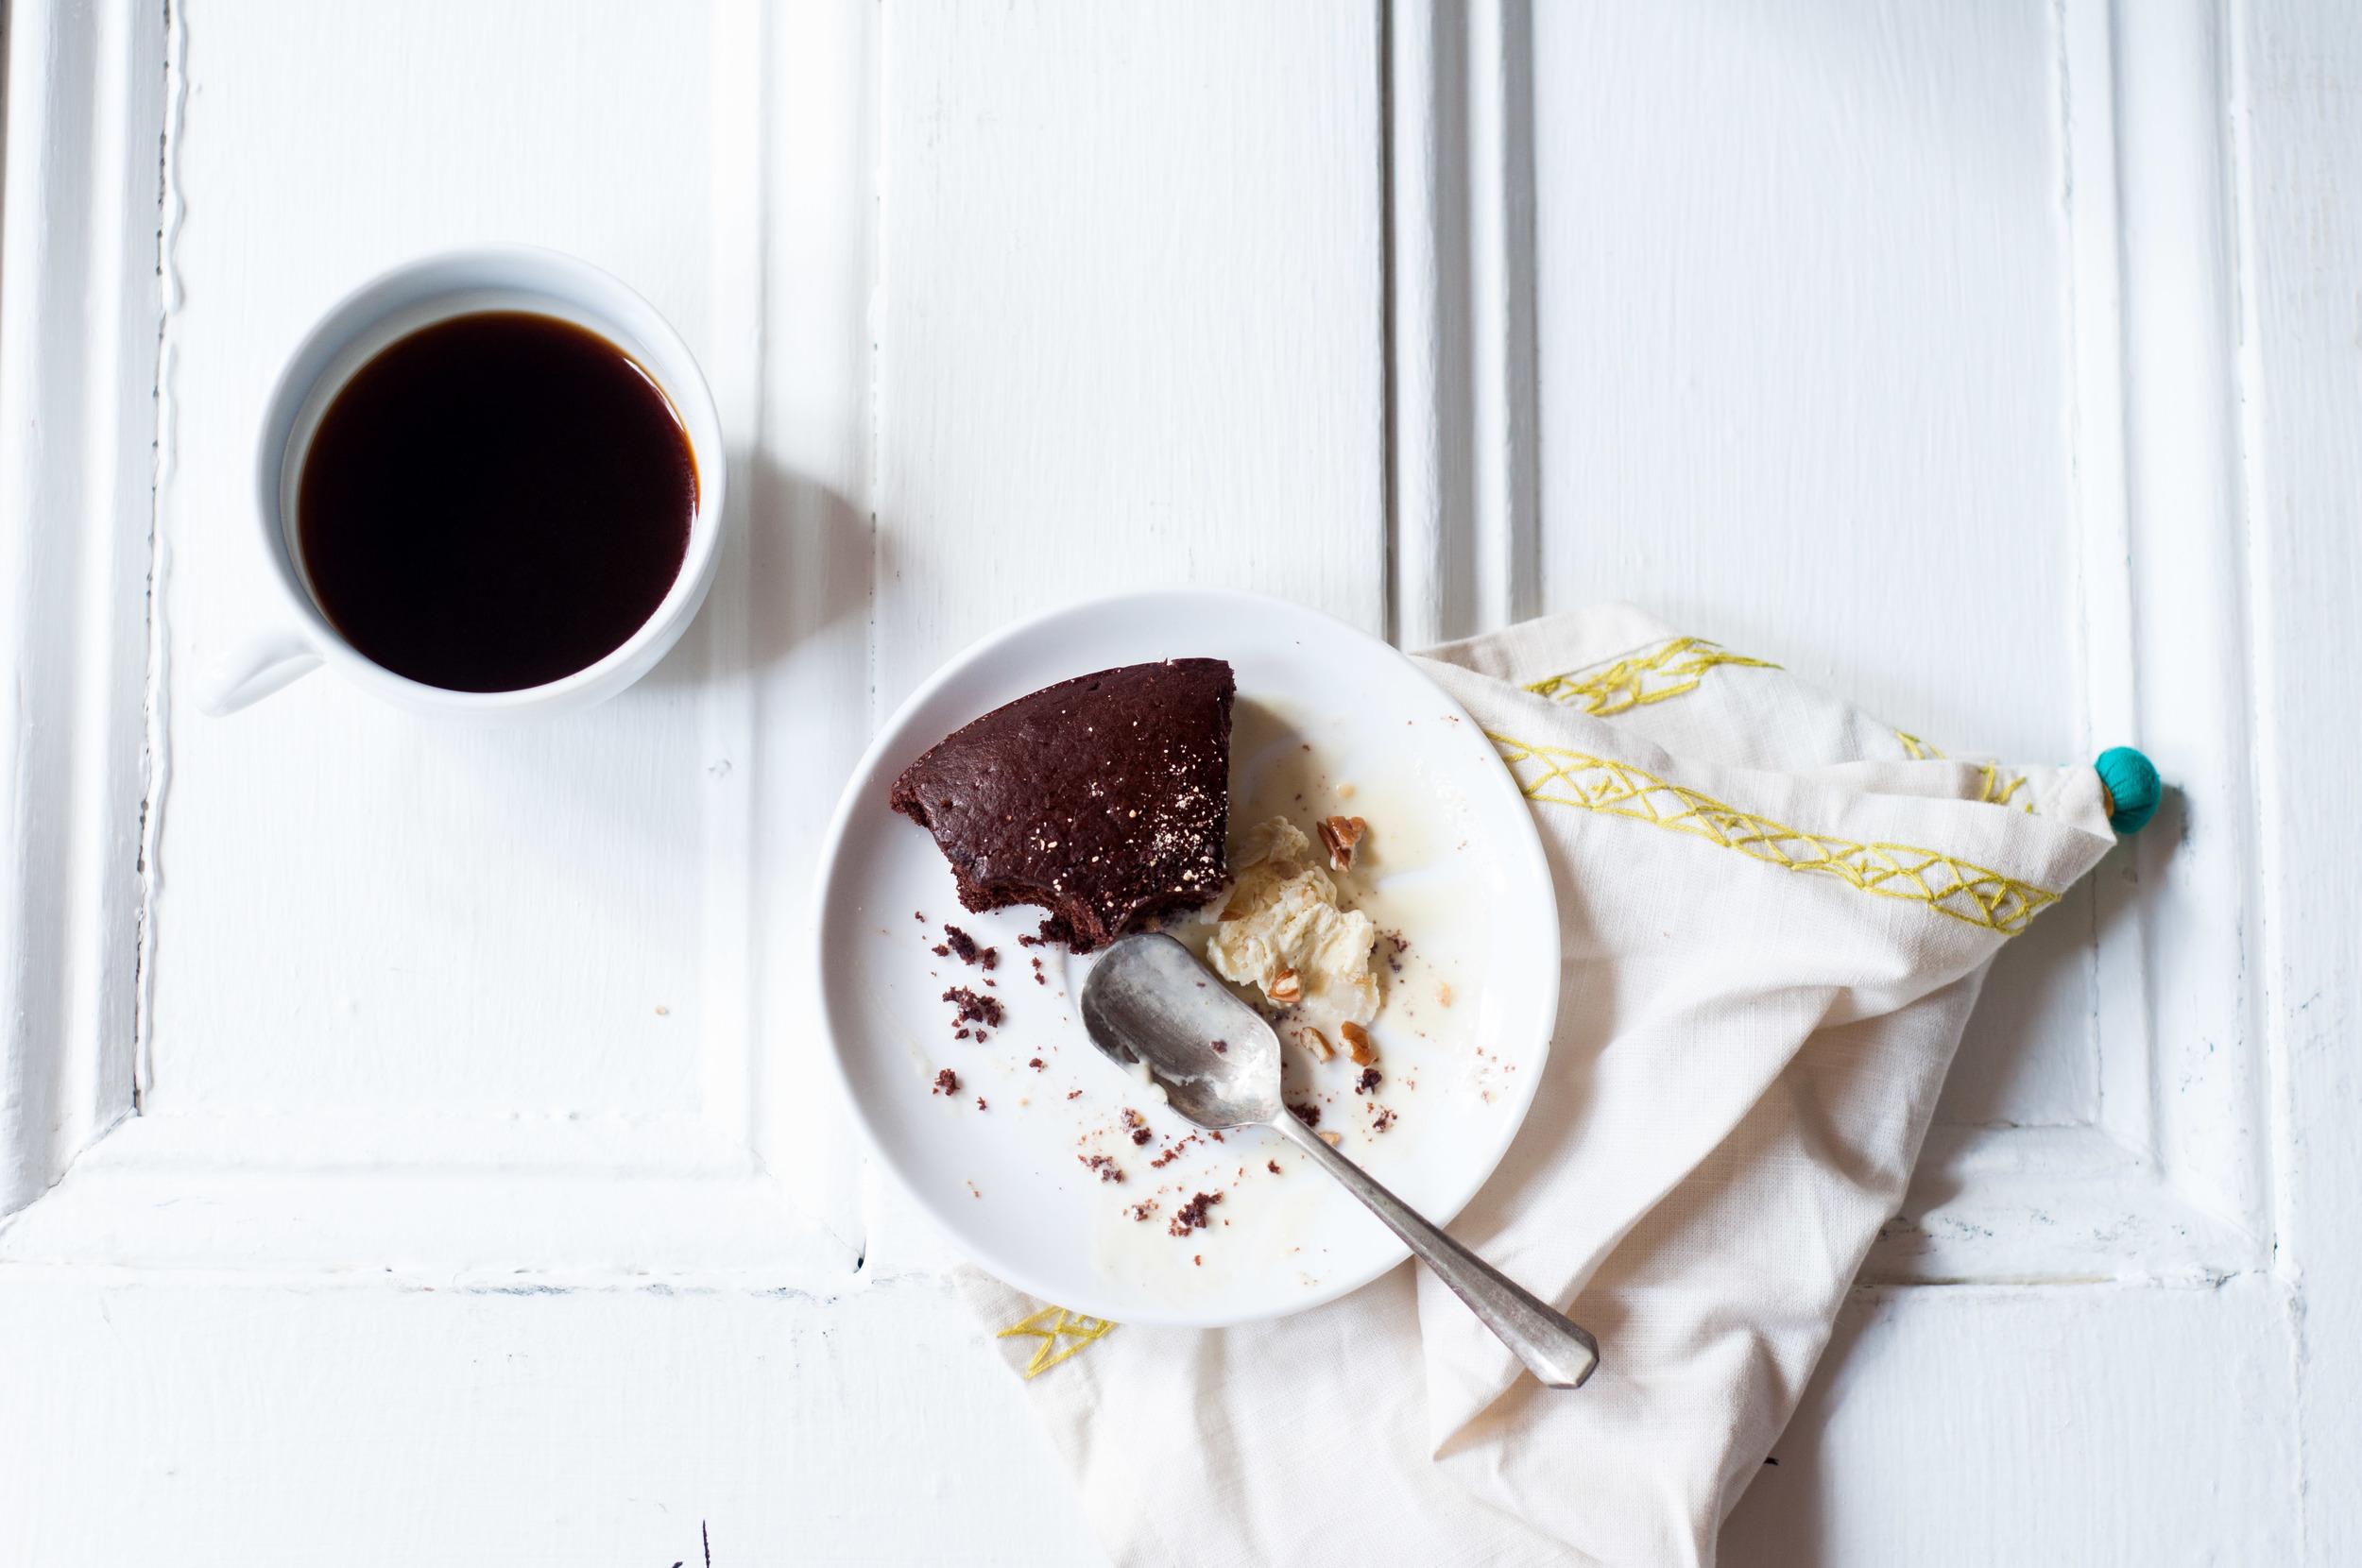 OAT + ALMOND CHOCOLATE CAKE